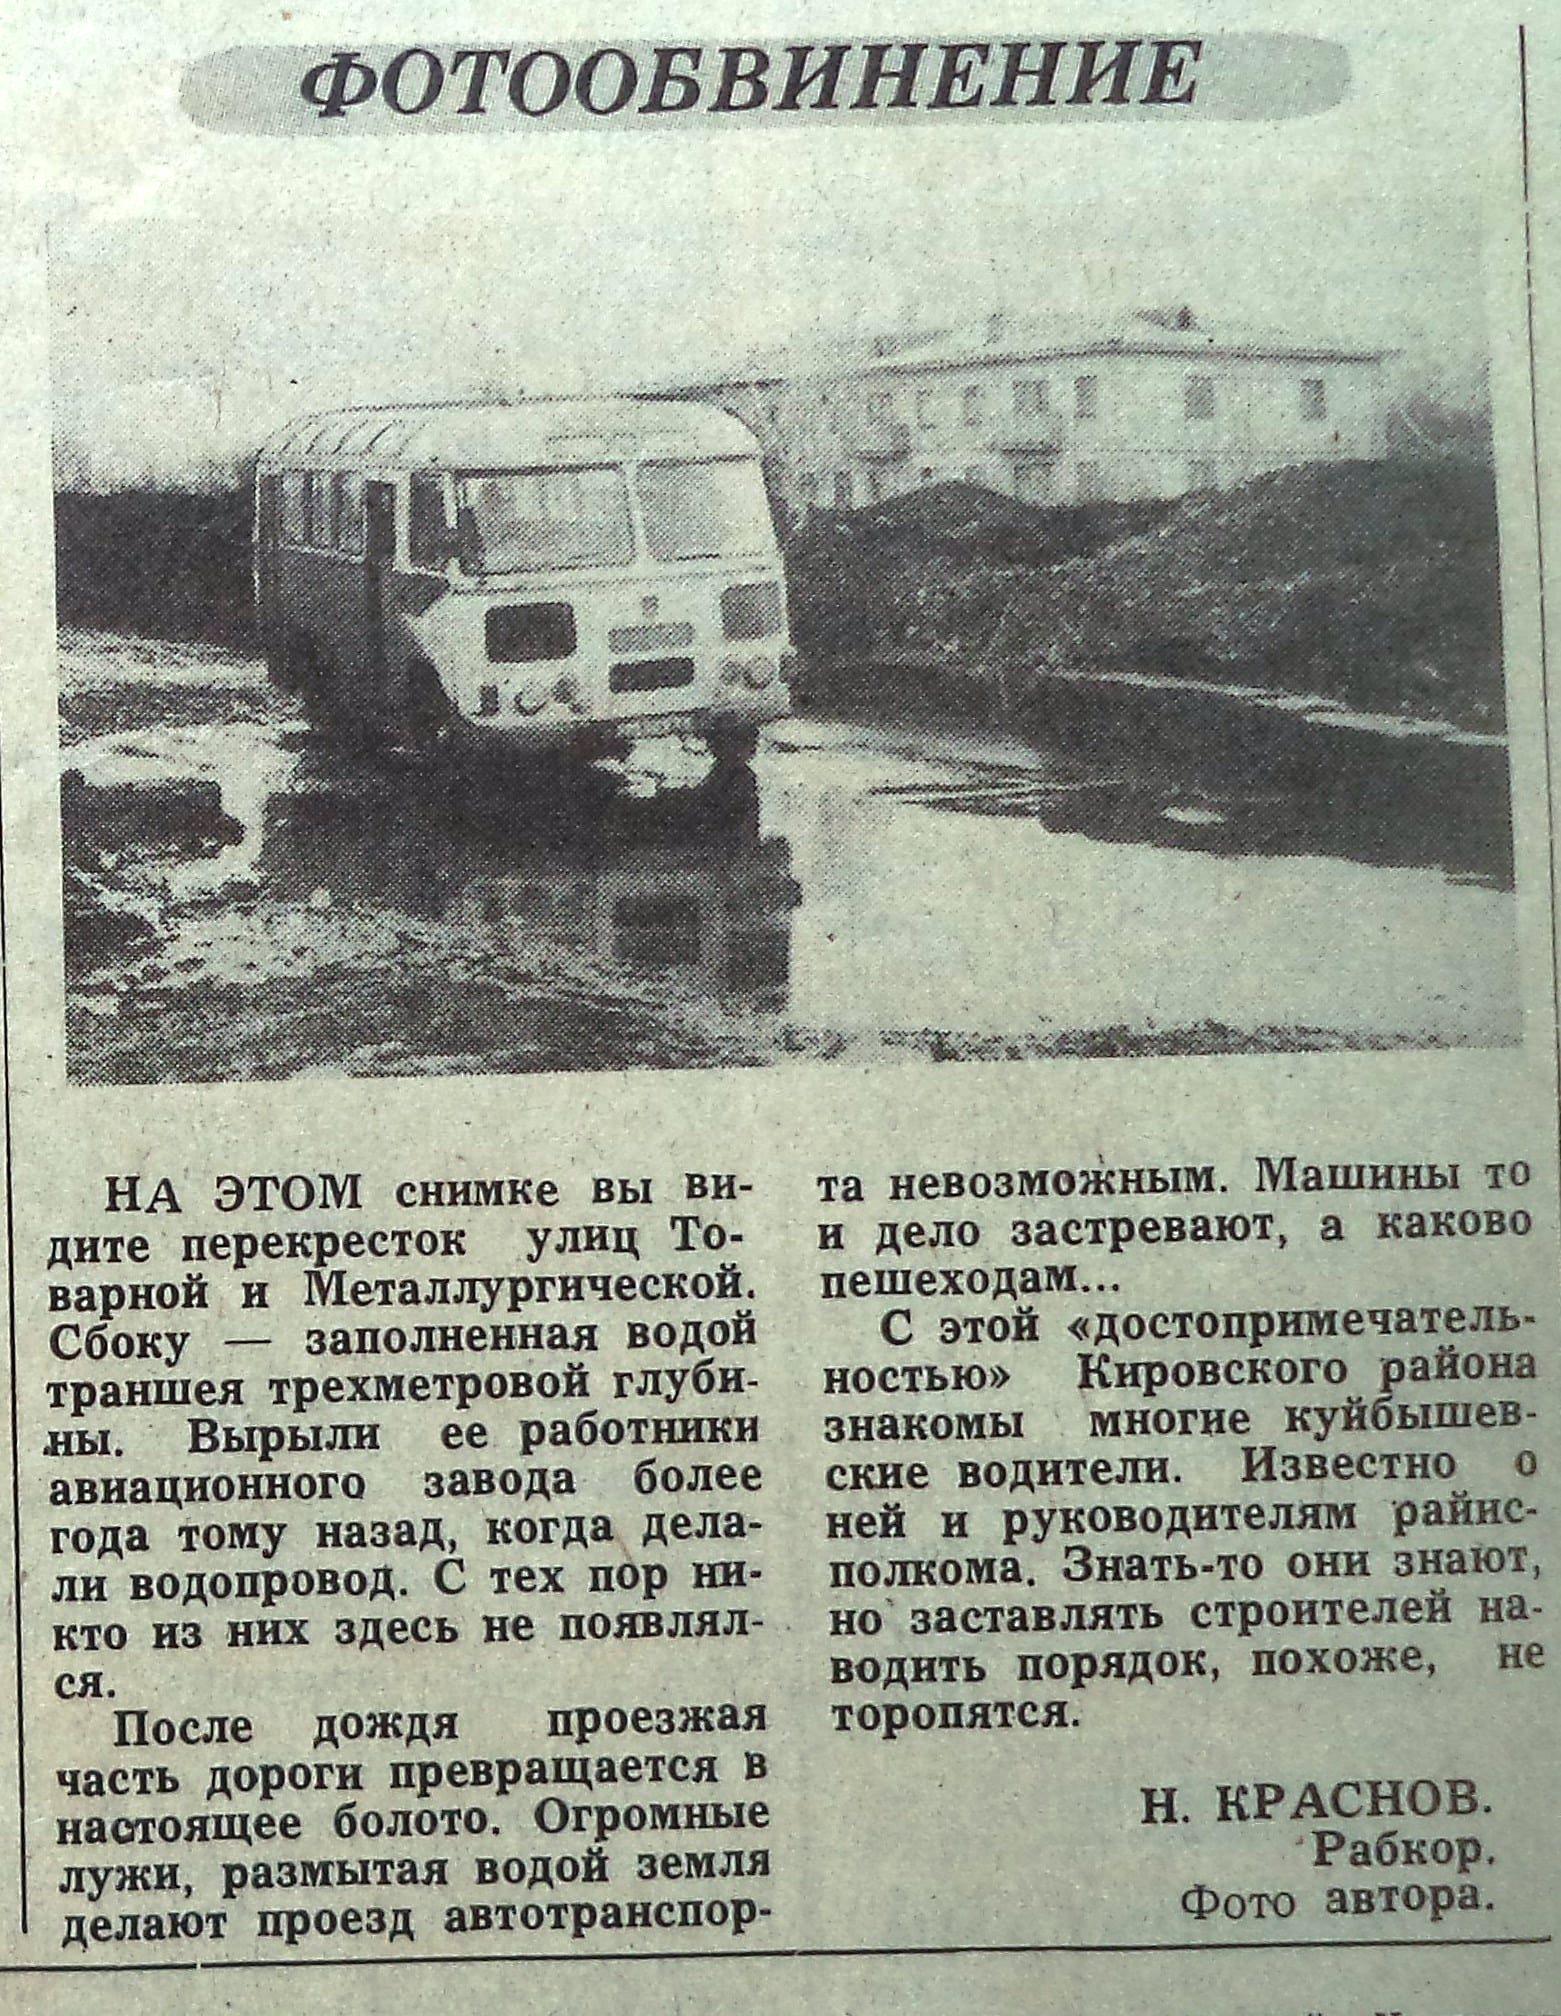 Товарная-ФОТО-05-ВЗя-1988-10-18-тек. неблаг-во по Тов.-min